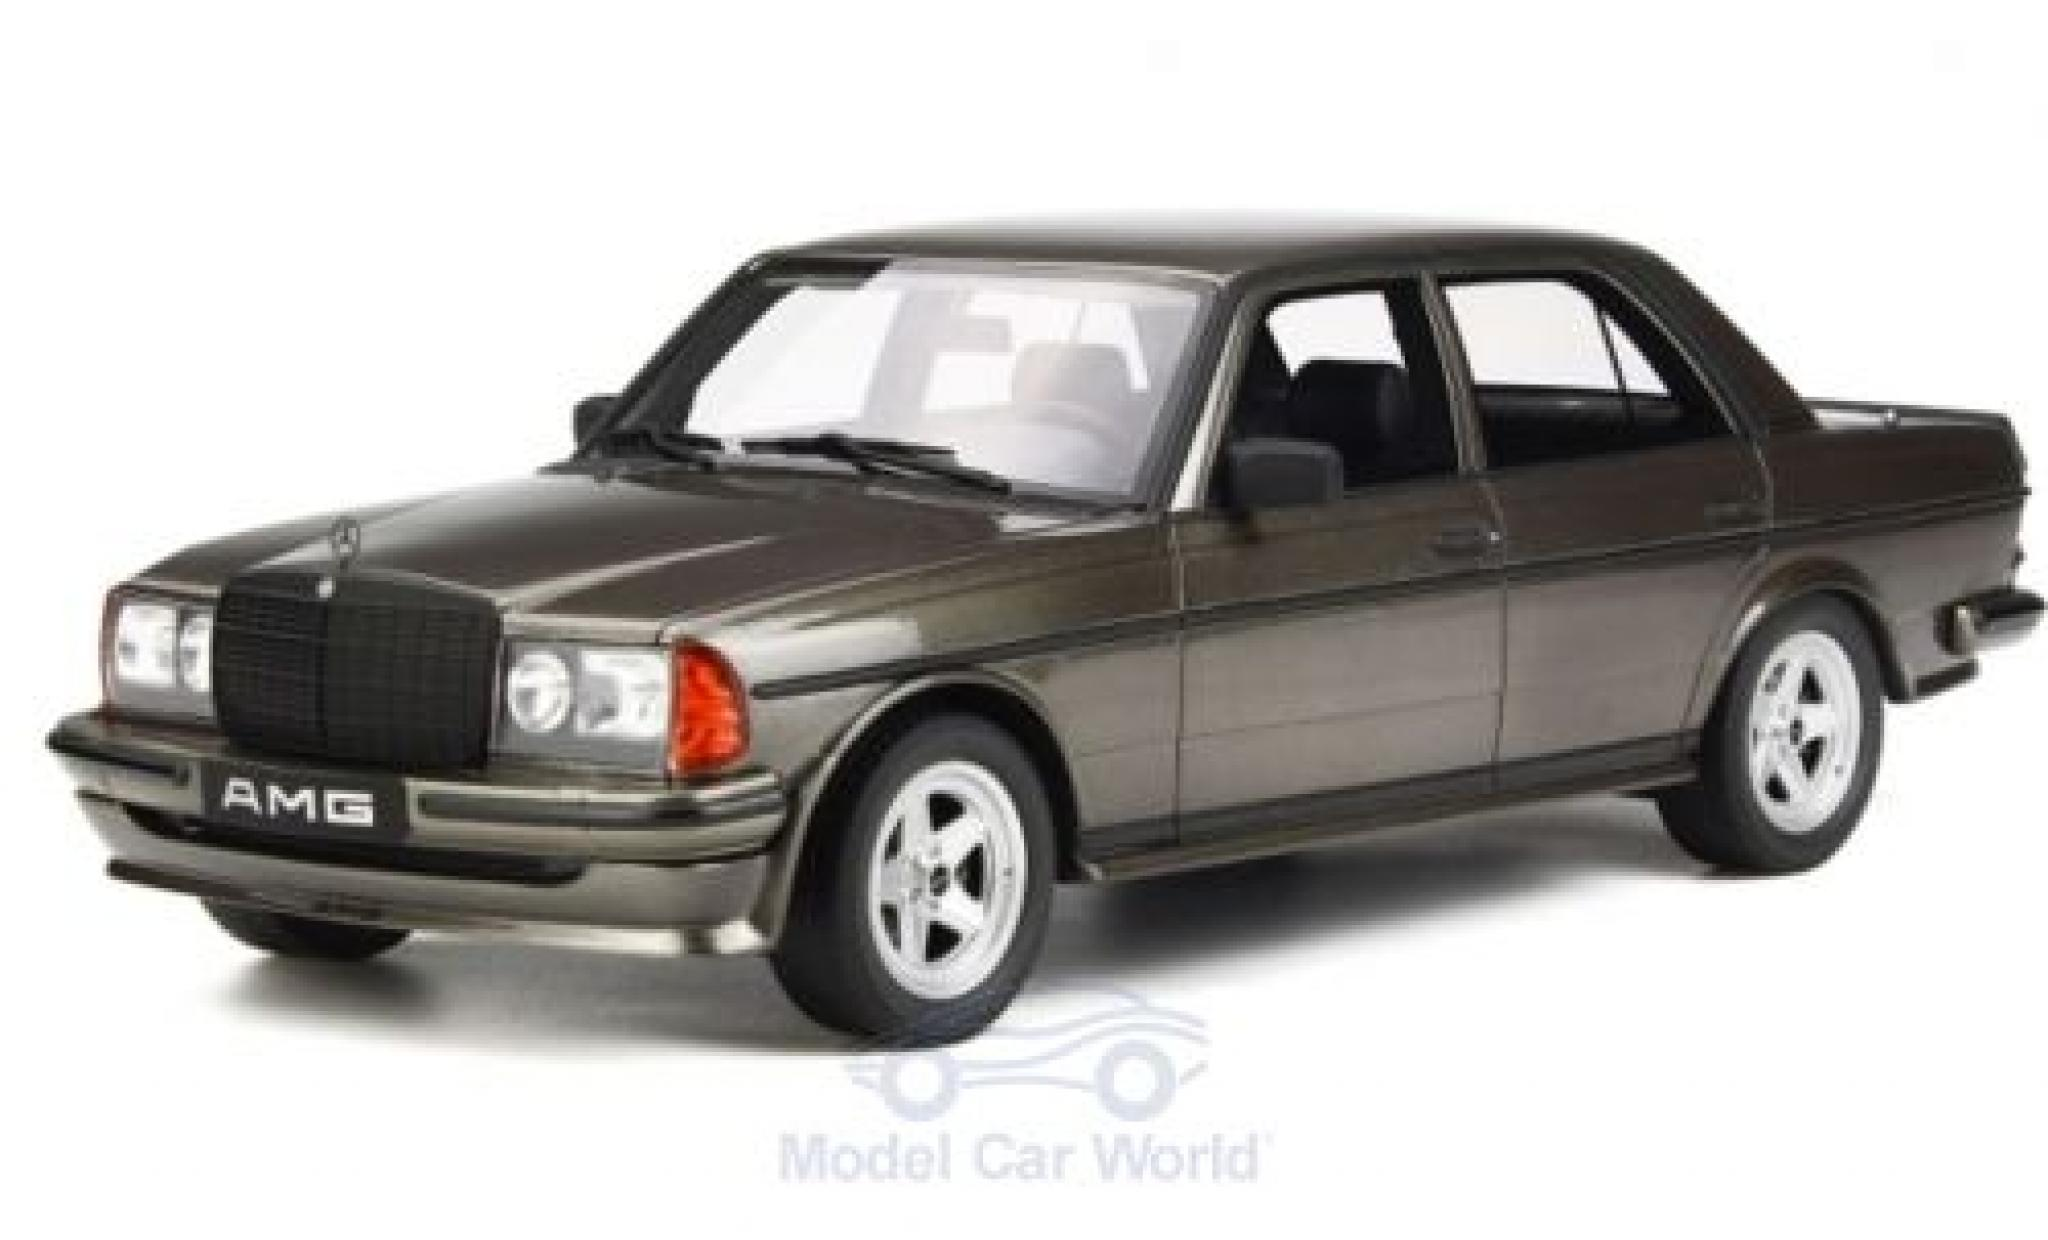 Mercedes 280 1980 1/18 Ottomobile AMG (W123) métallisé grise 1980